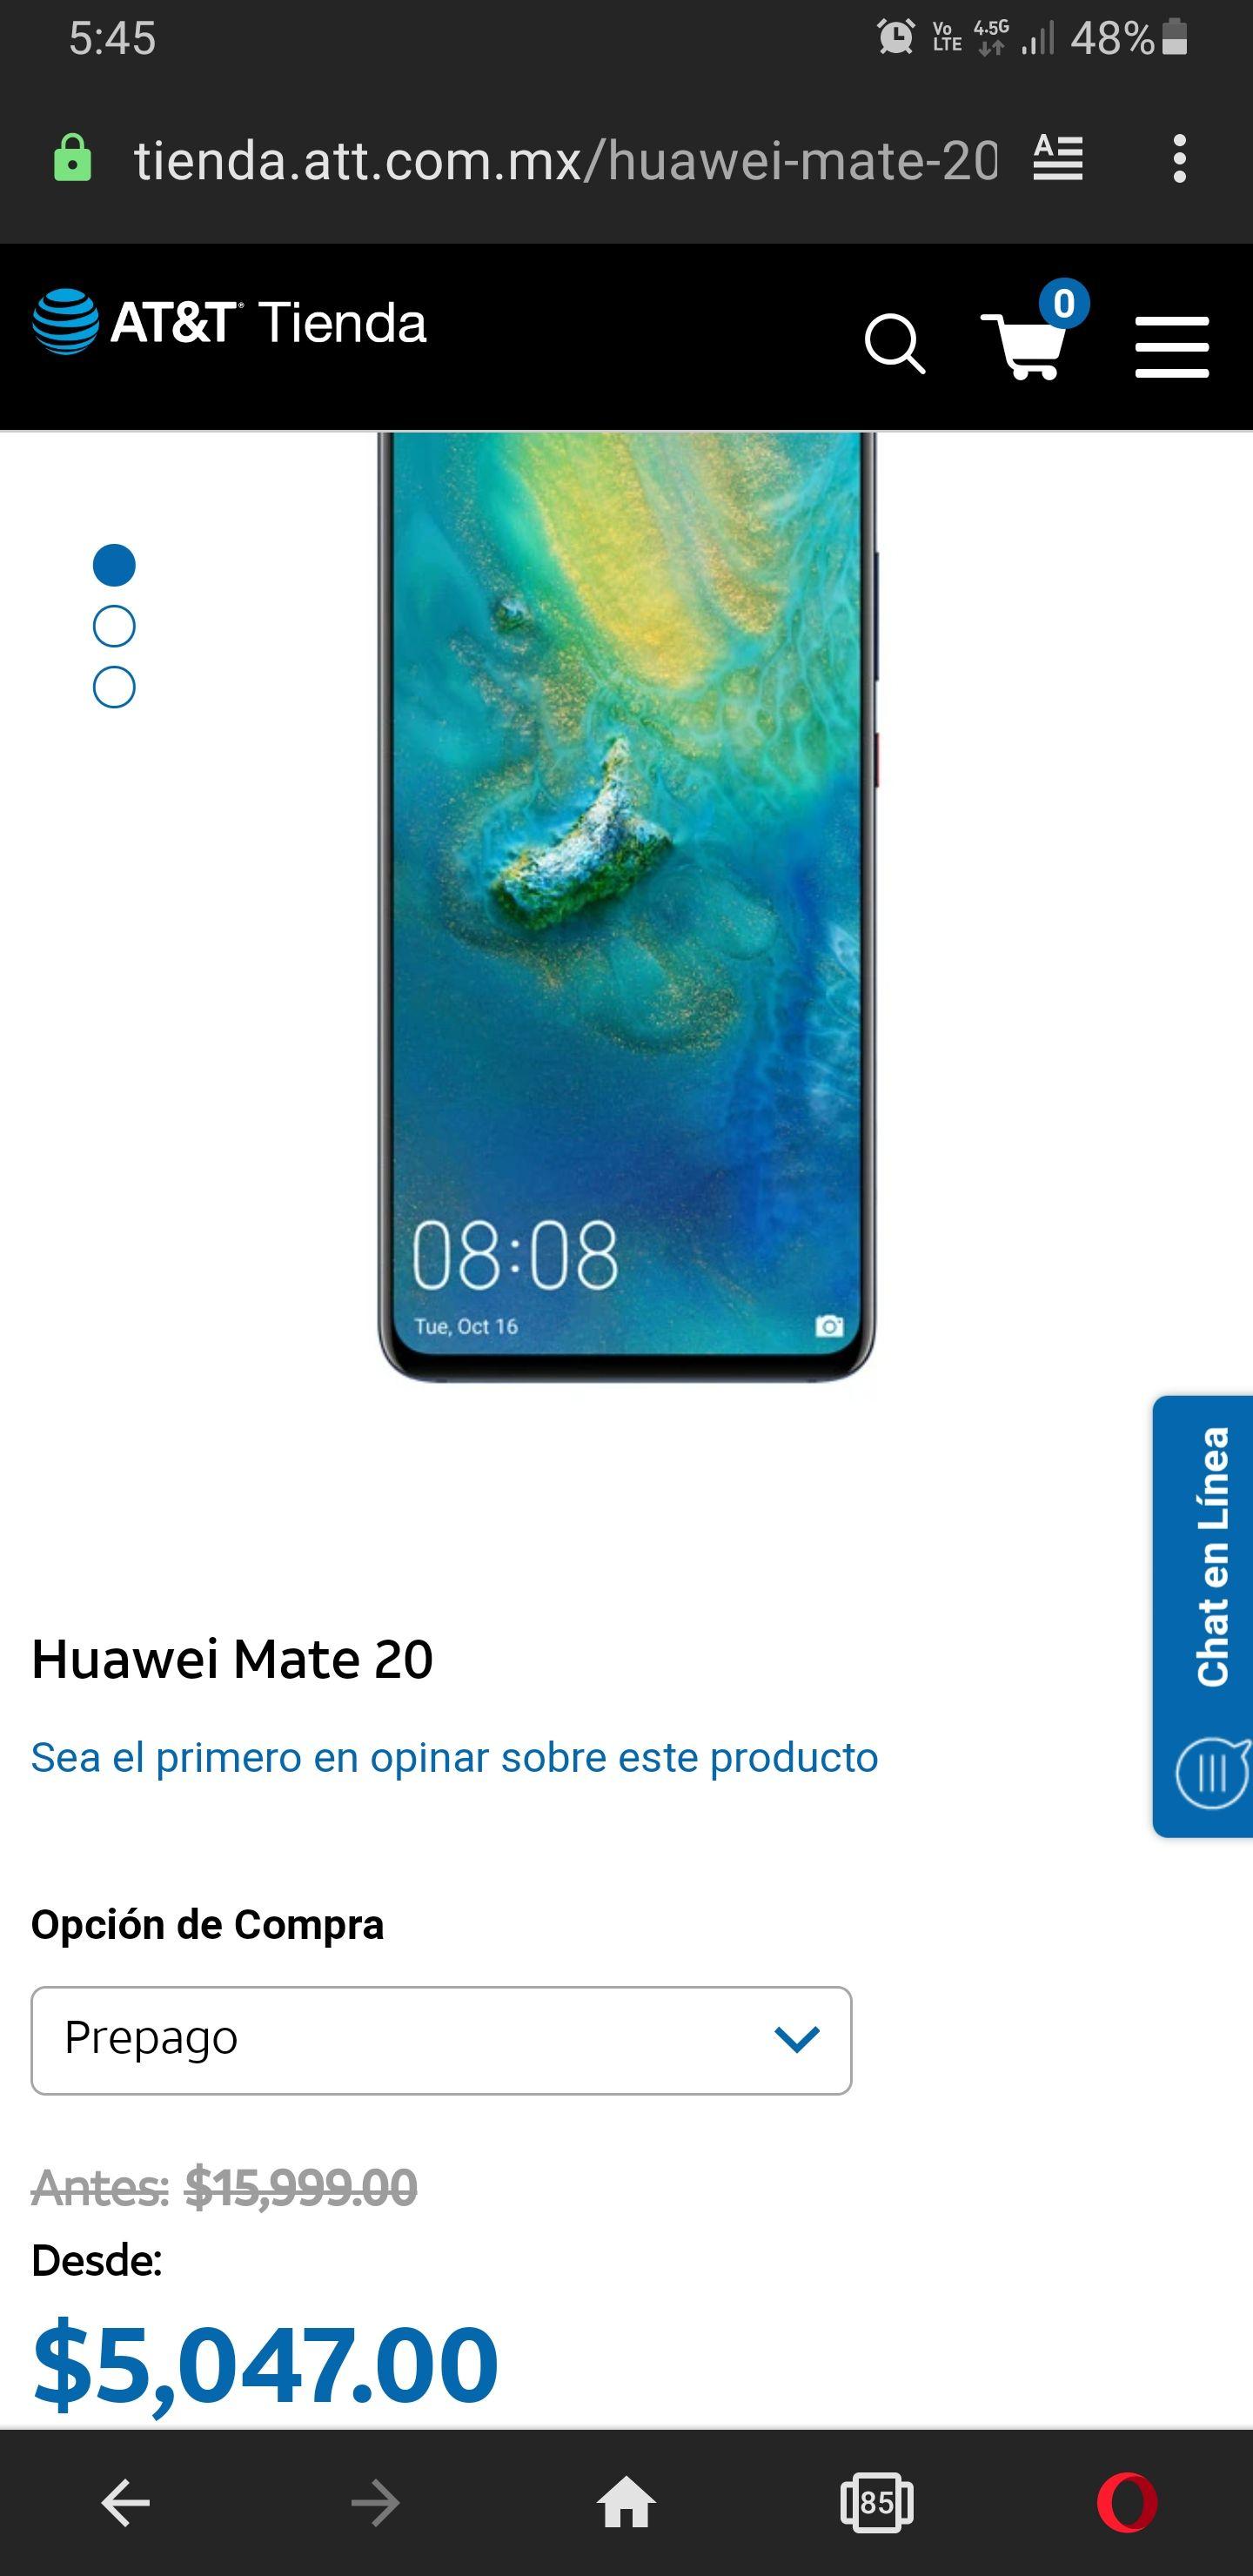 AT&T: Huawei Mate 20 128 GB